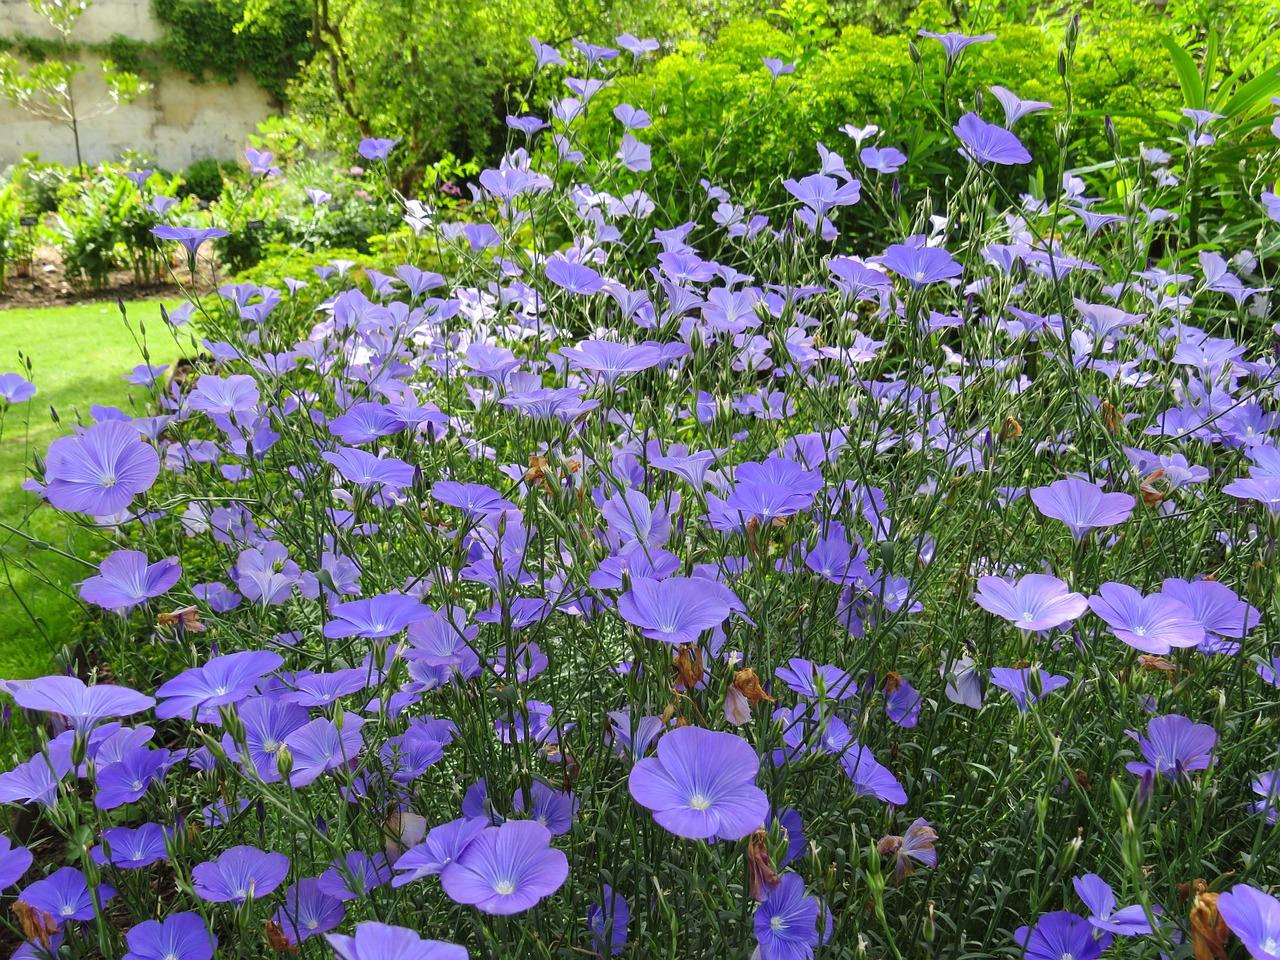 blueflowersgardenenglishsummerfloral - English Flowers Garden